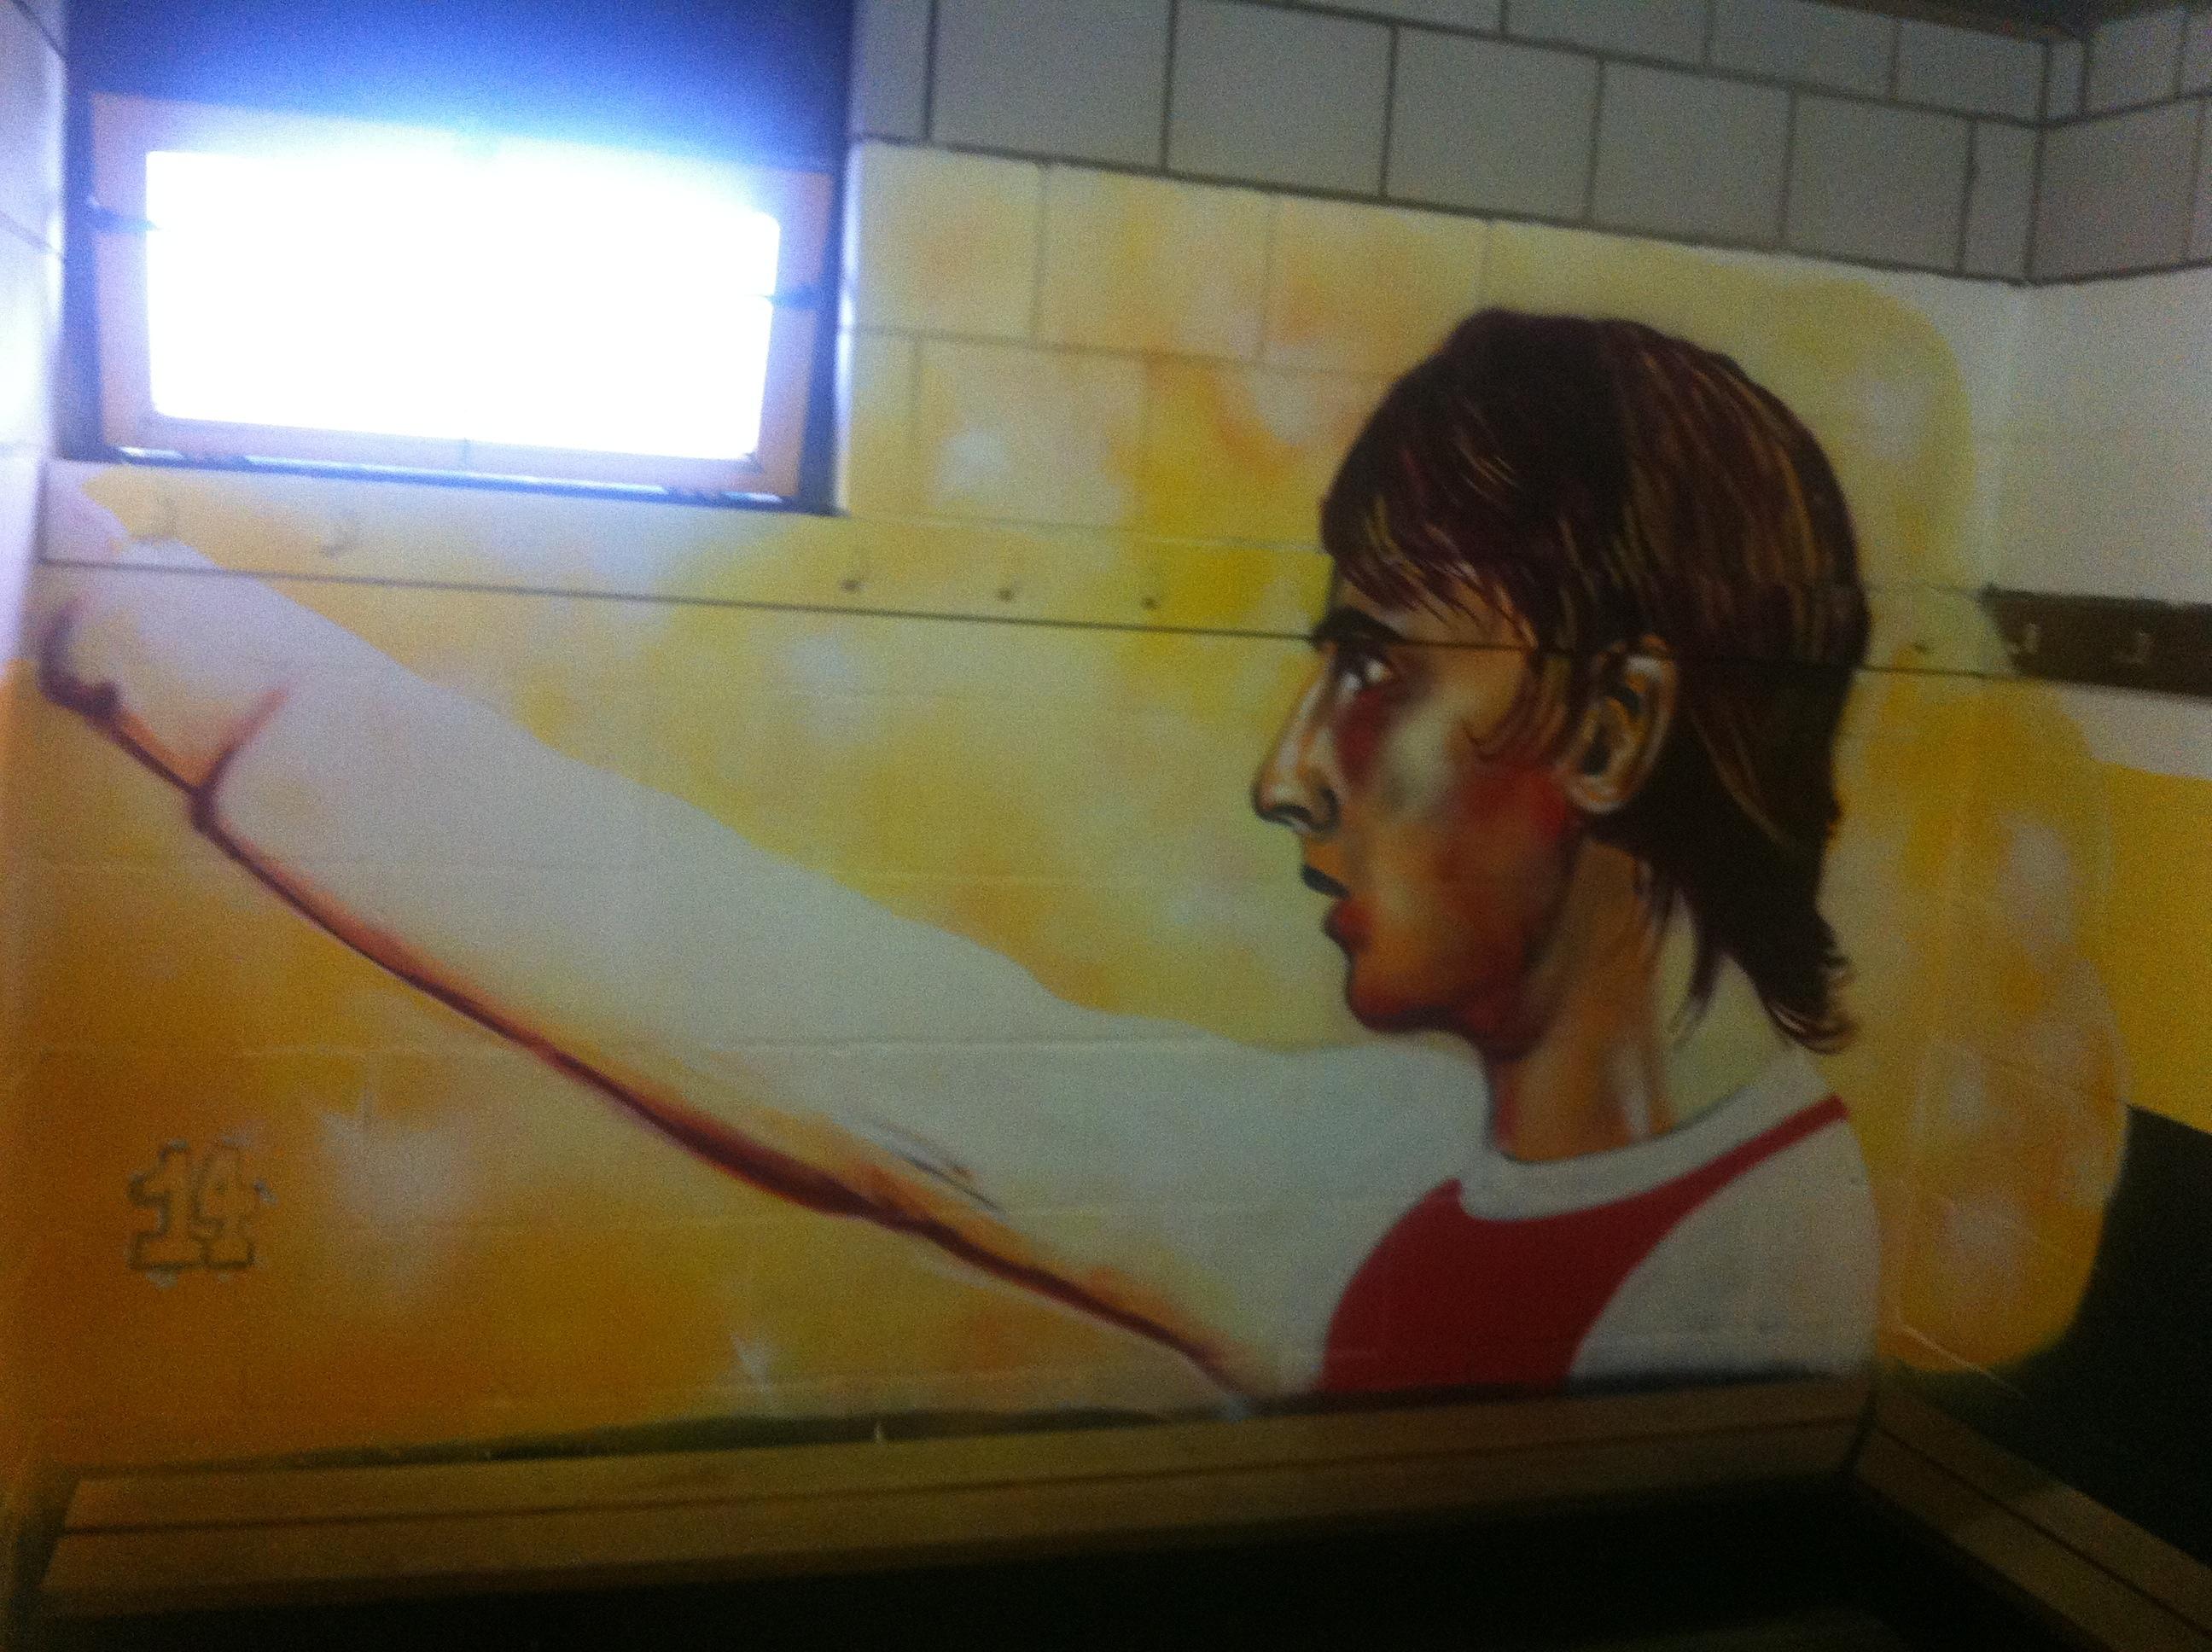 Kleedkamergraffiti als sponsormodel bij voetbalclub - Sport Knowhow XL